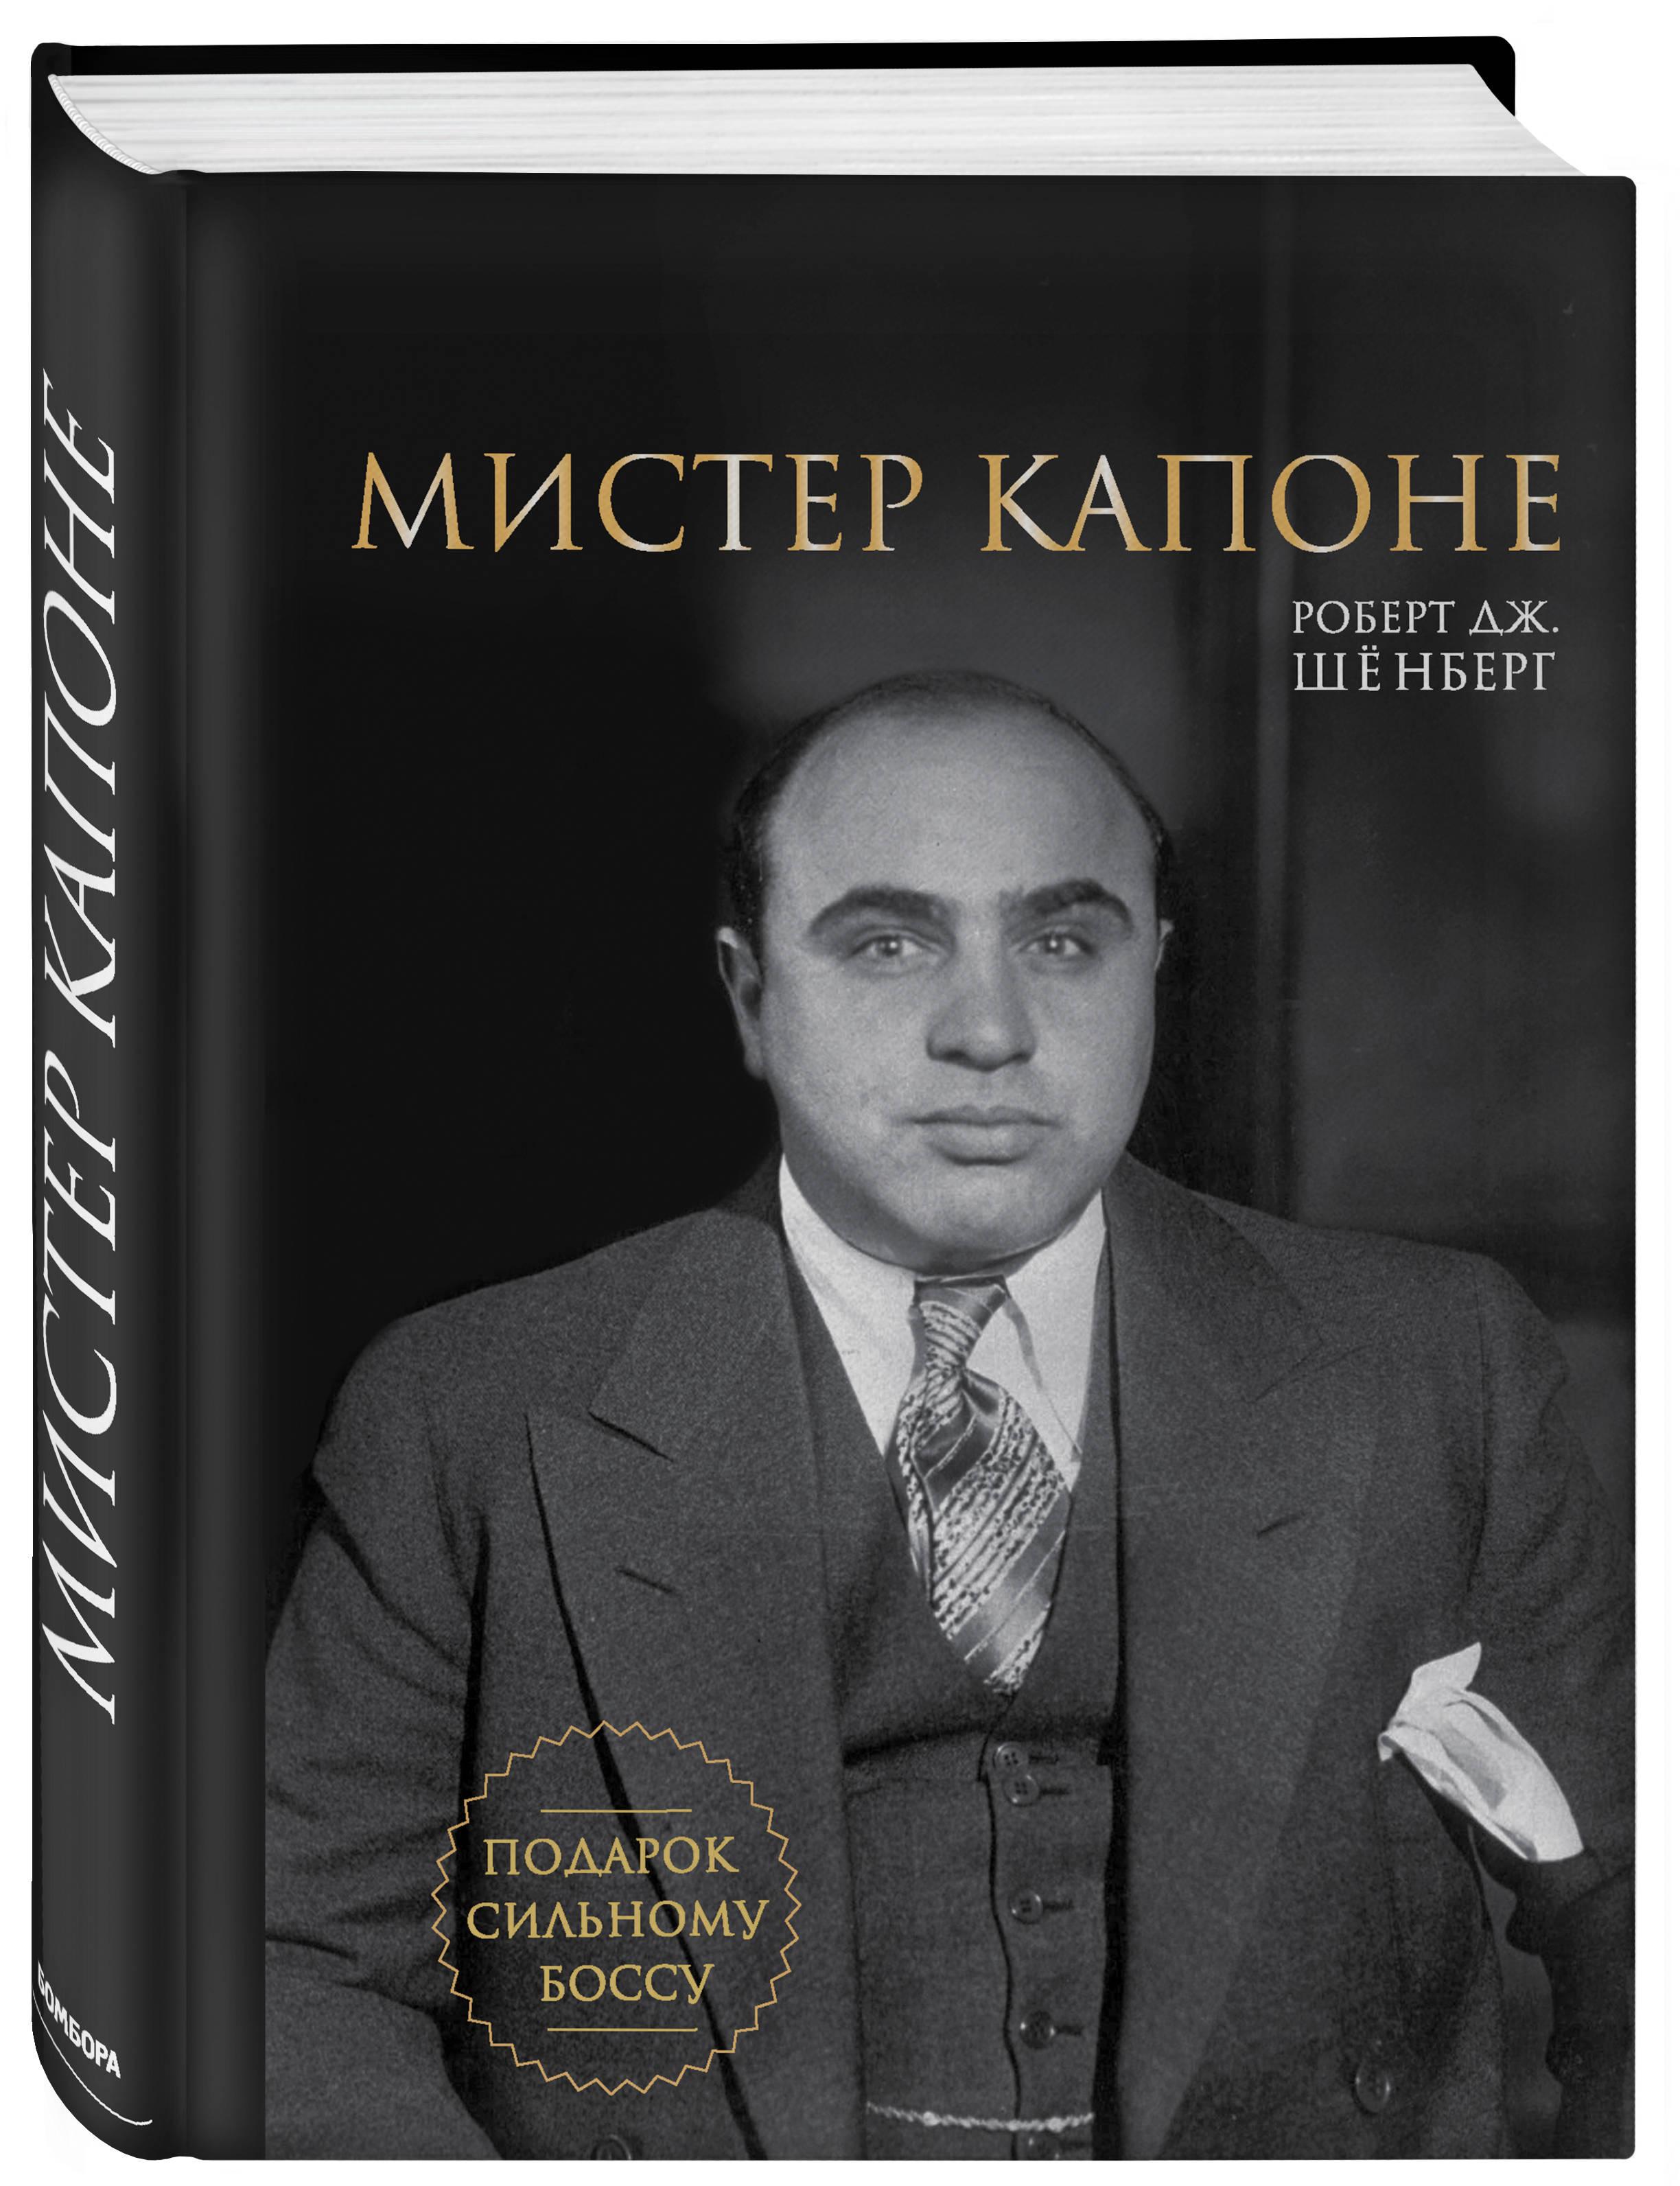 Шёнберг Роберт Мистер Капоне. Подарок сильному боссу